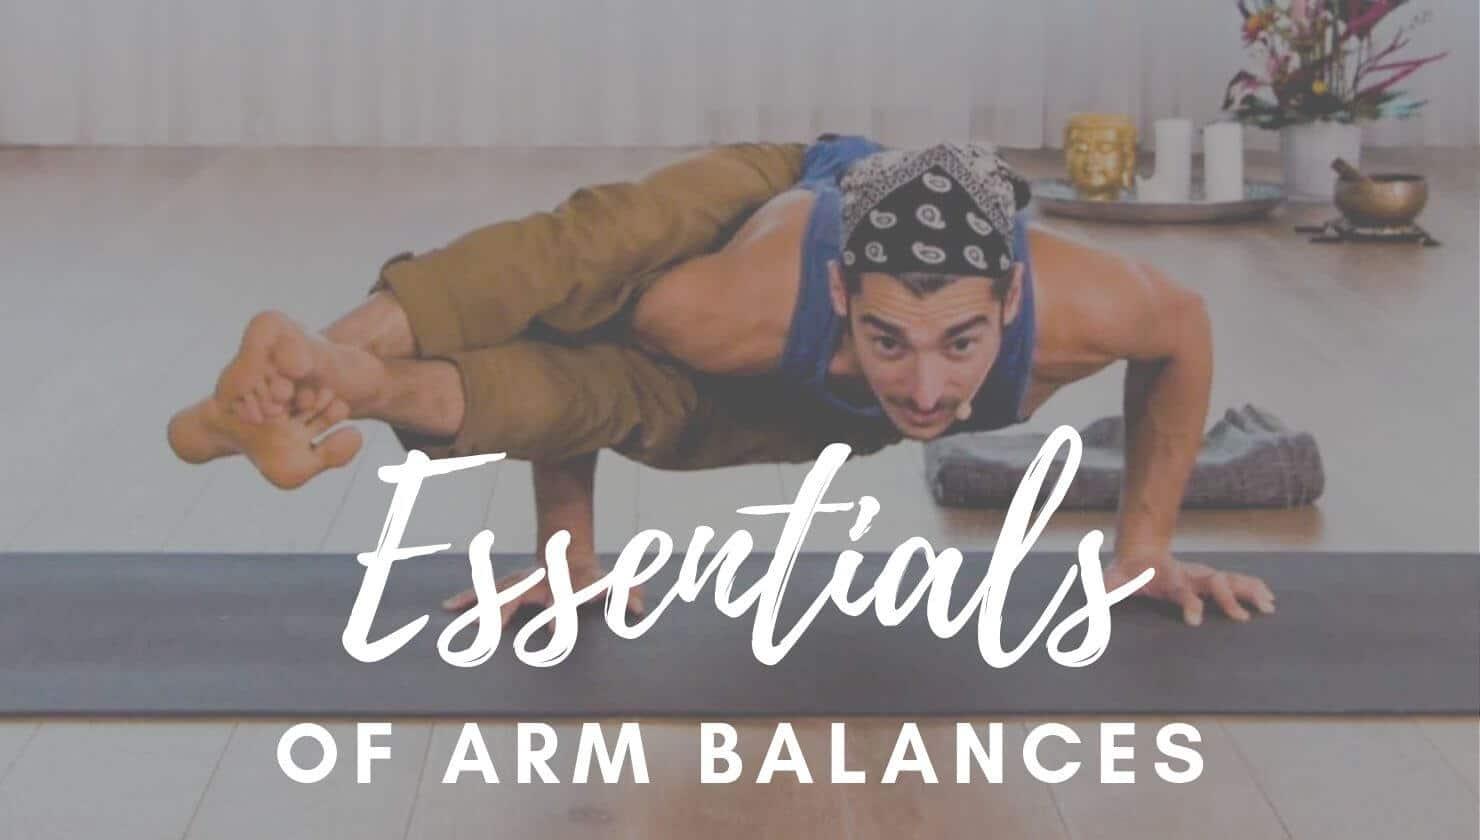 Essentials of Arm Balances by Matt Giordano Yoga - Theyogimatt